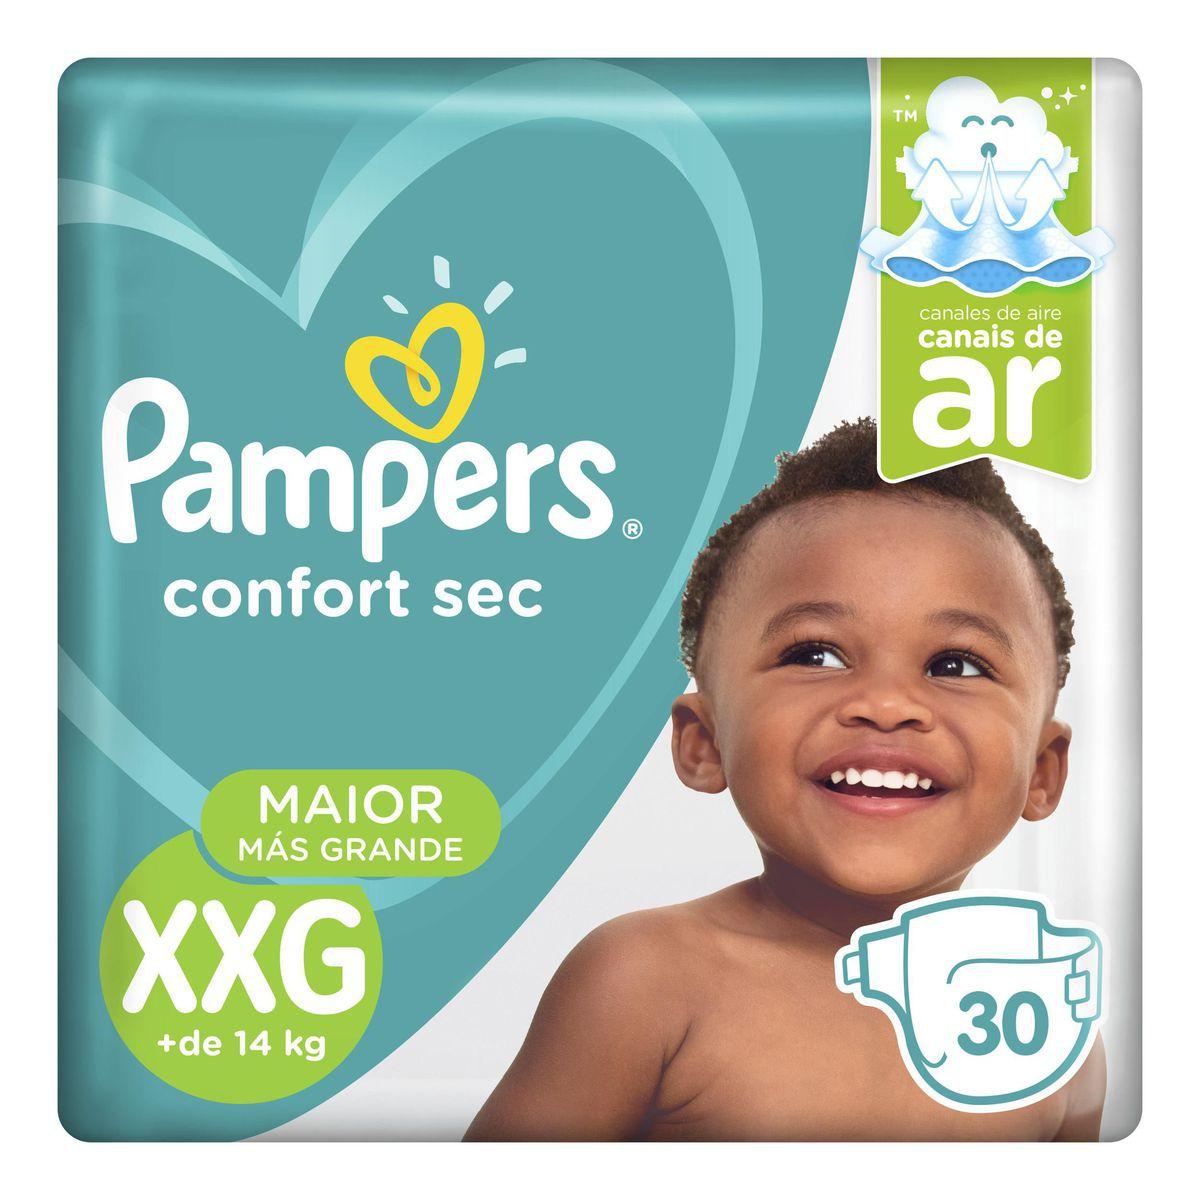 Fralda Pampers Confort Sec Mega - XXG 30 unidades